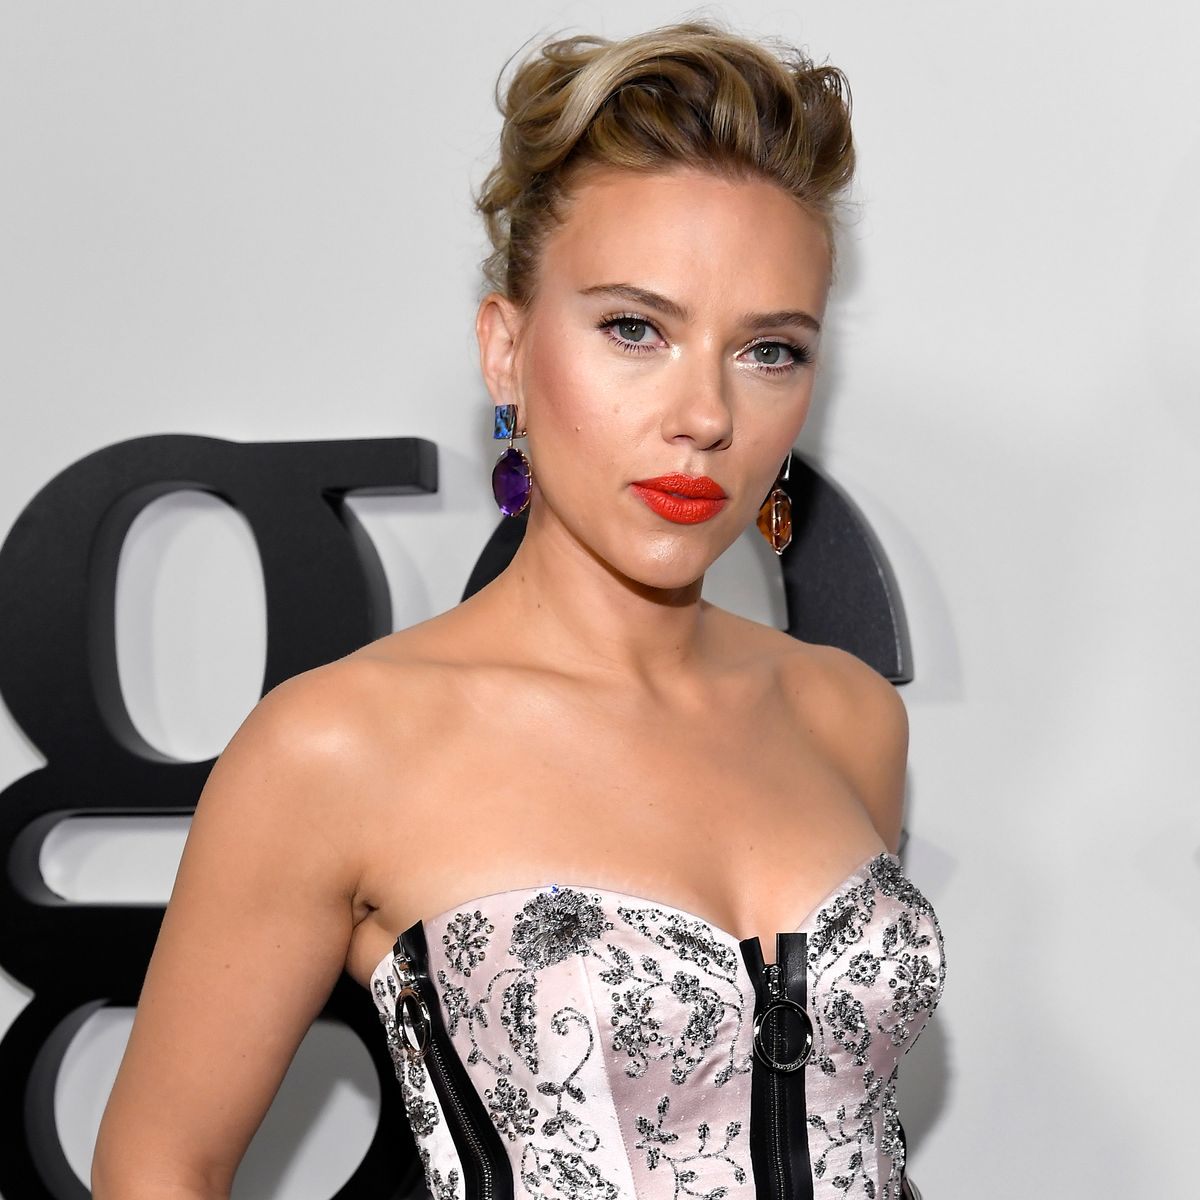 Scarlett Johansson Mishandled Transgender Role Backlash